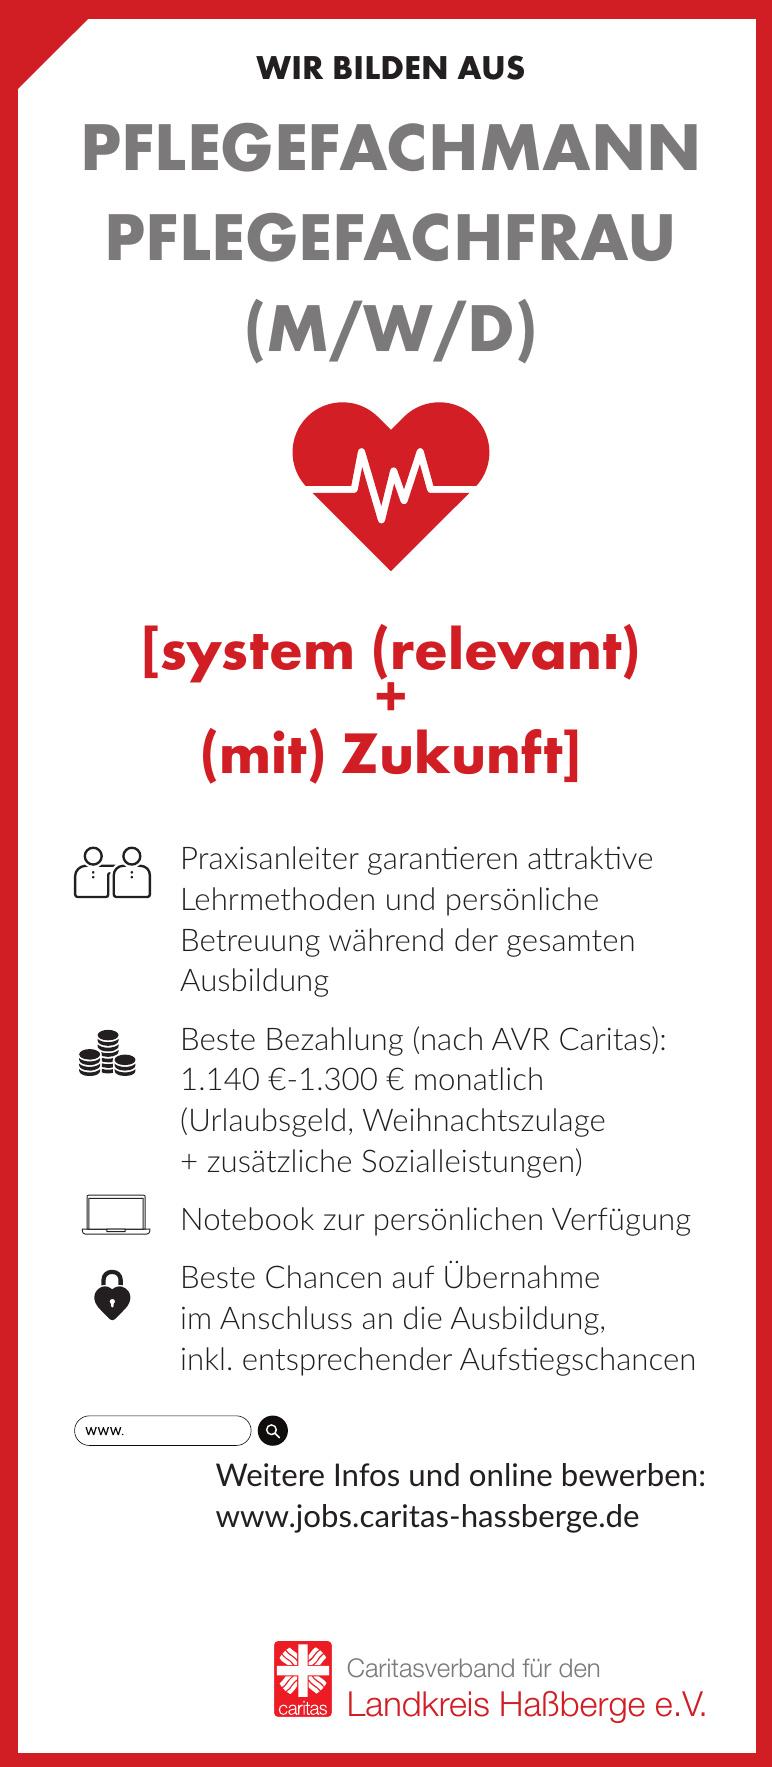 Caritasverband für den Landkreis Haßberge e. V.